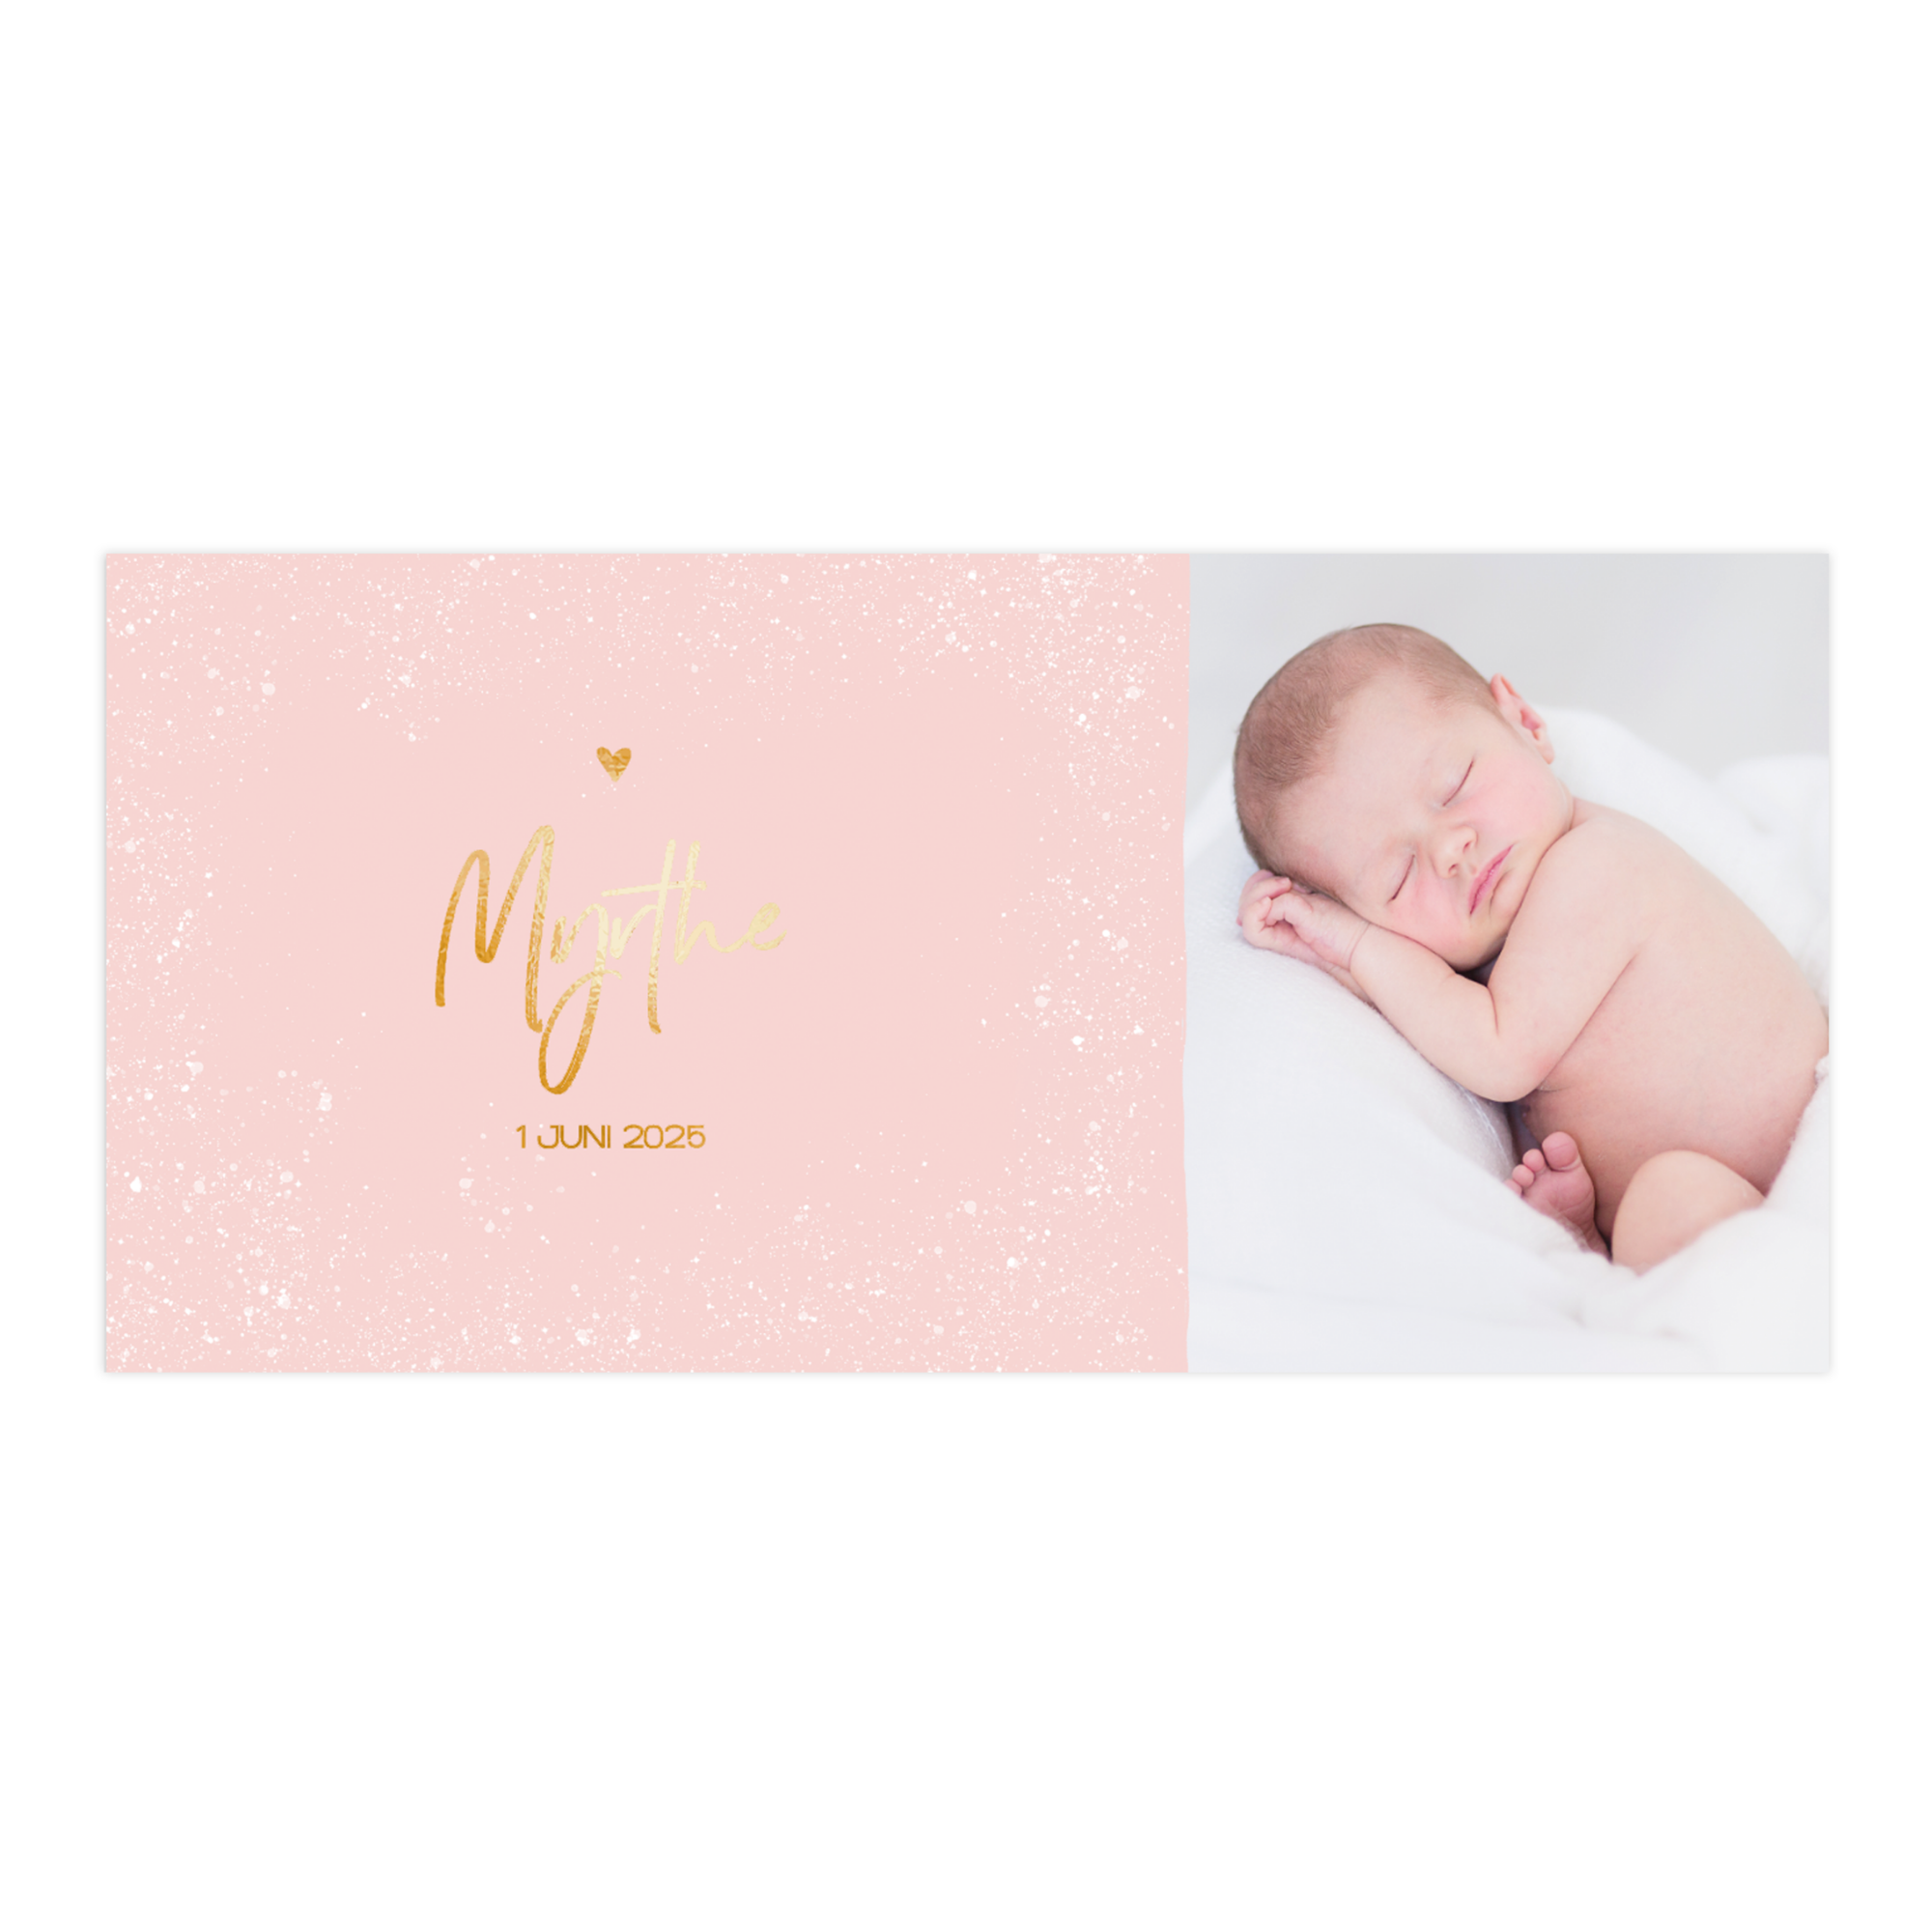 Lieve goudfolie geboortekaart roze met witte verf spettertjes en foto